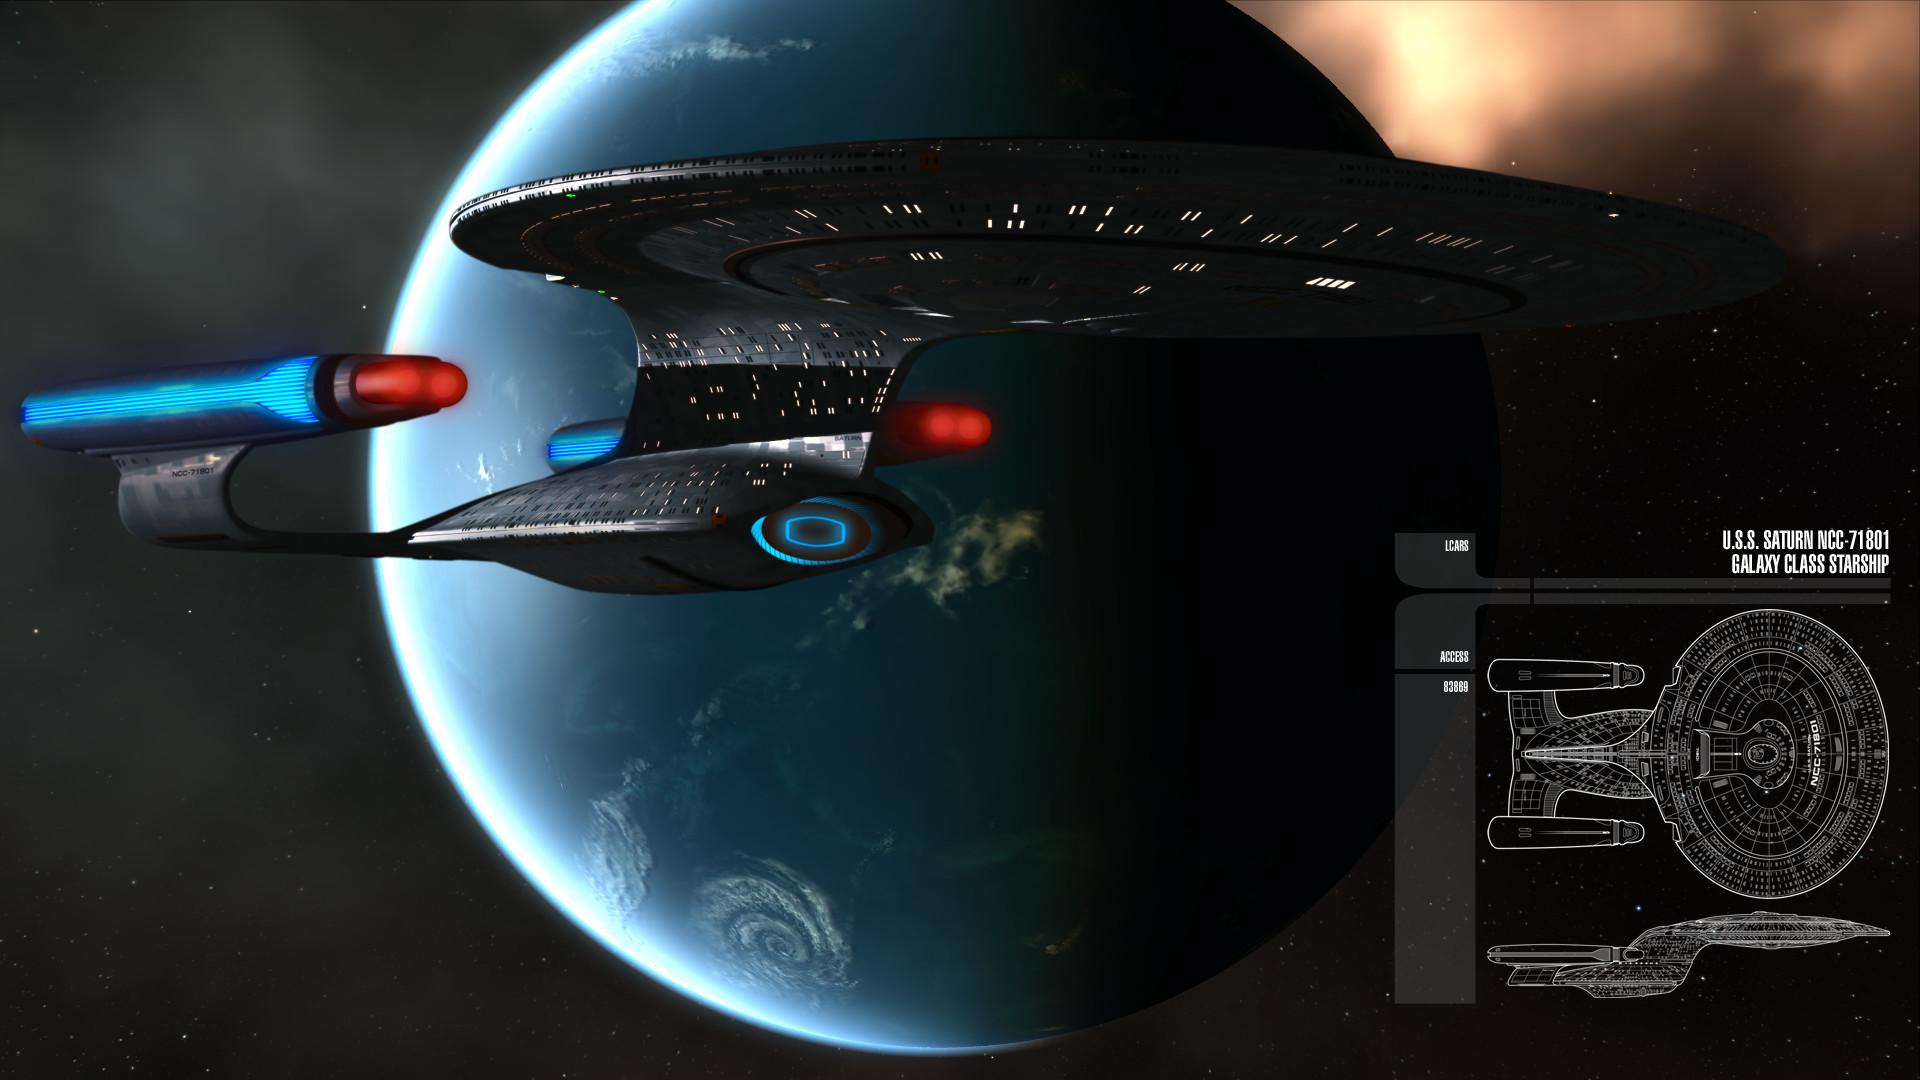 Galaxy Class Starship Wallpaper ·① WallpaperTag